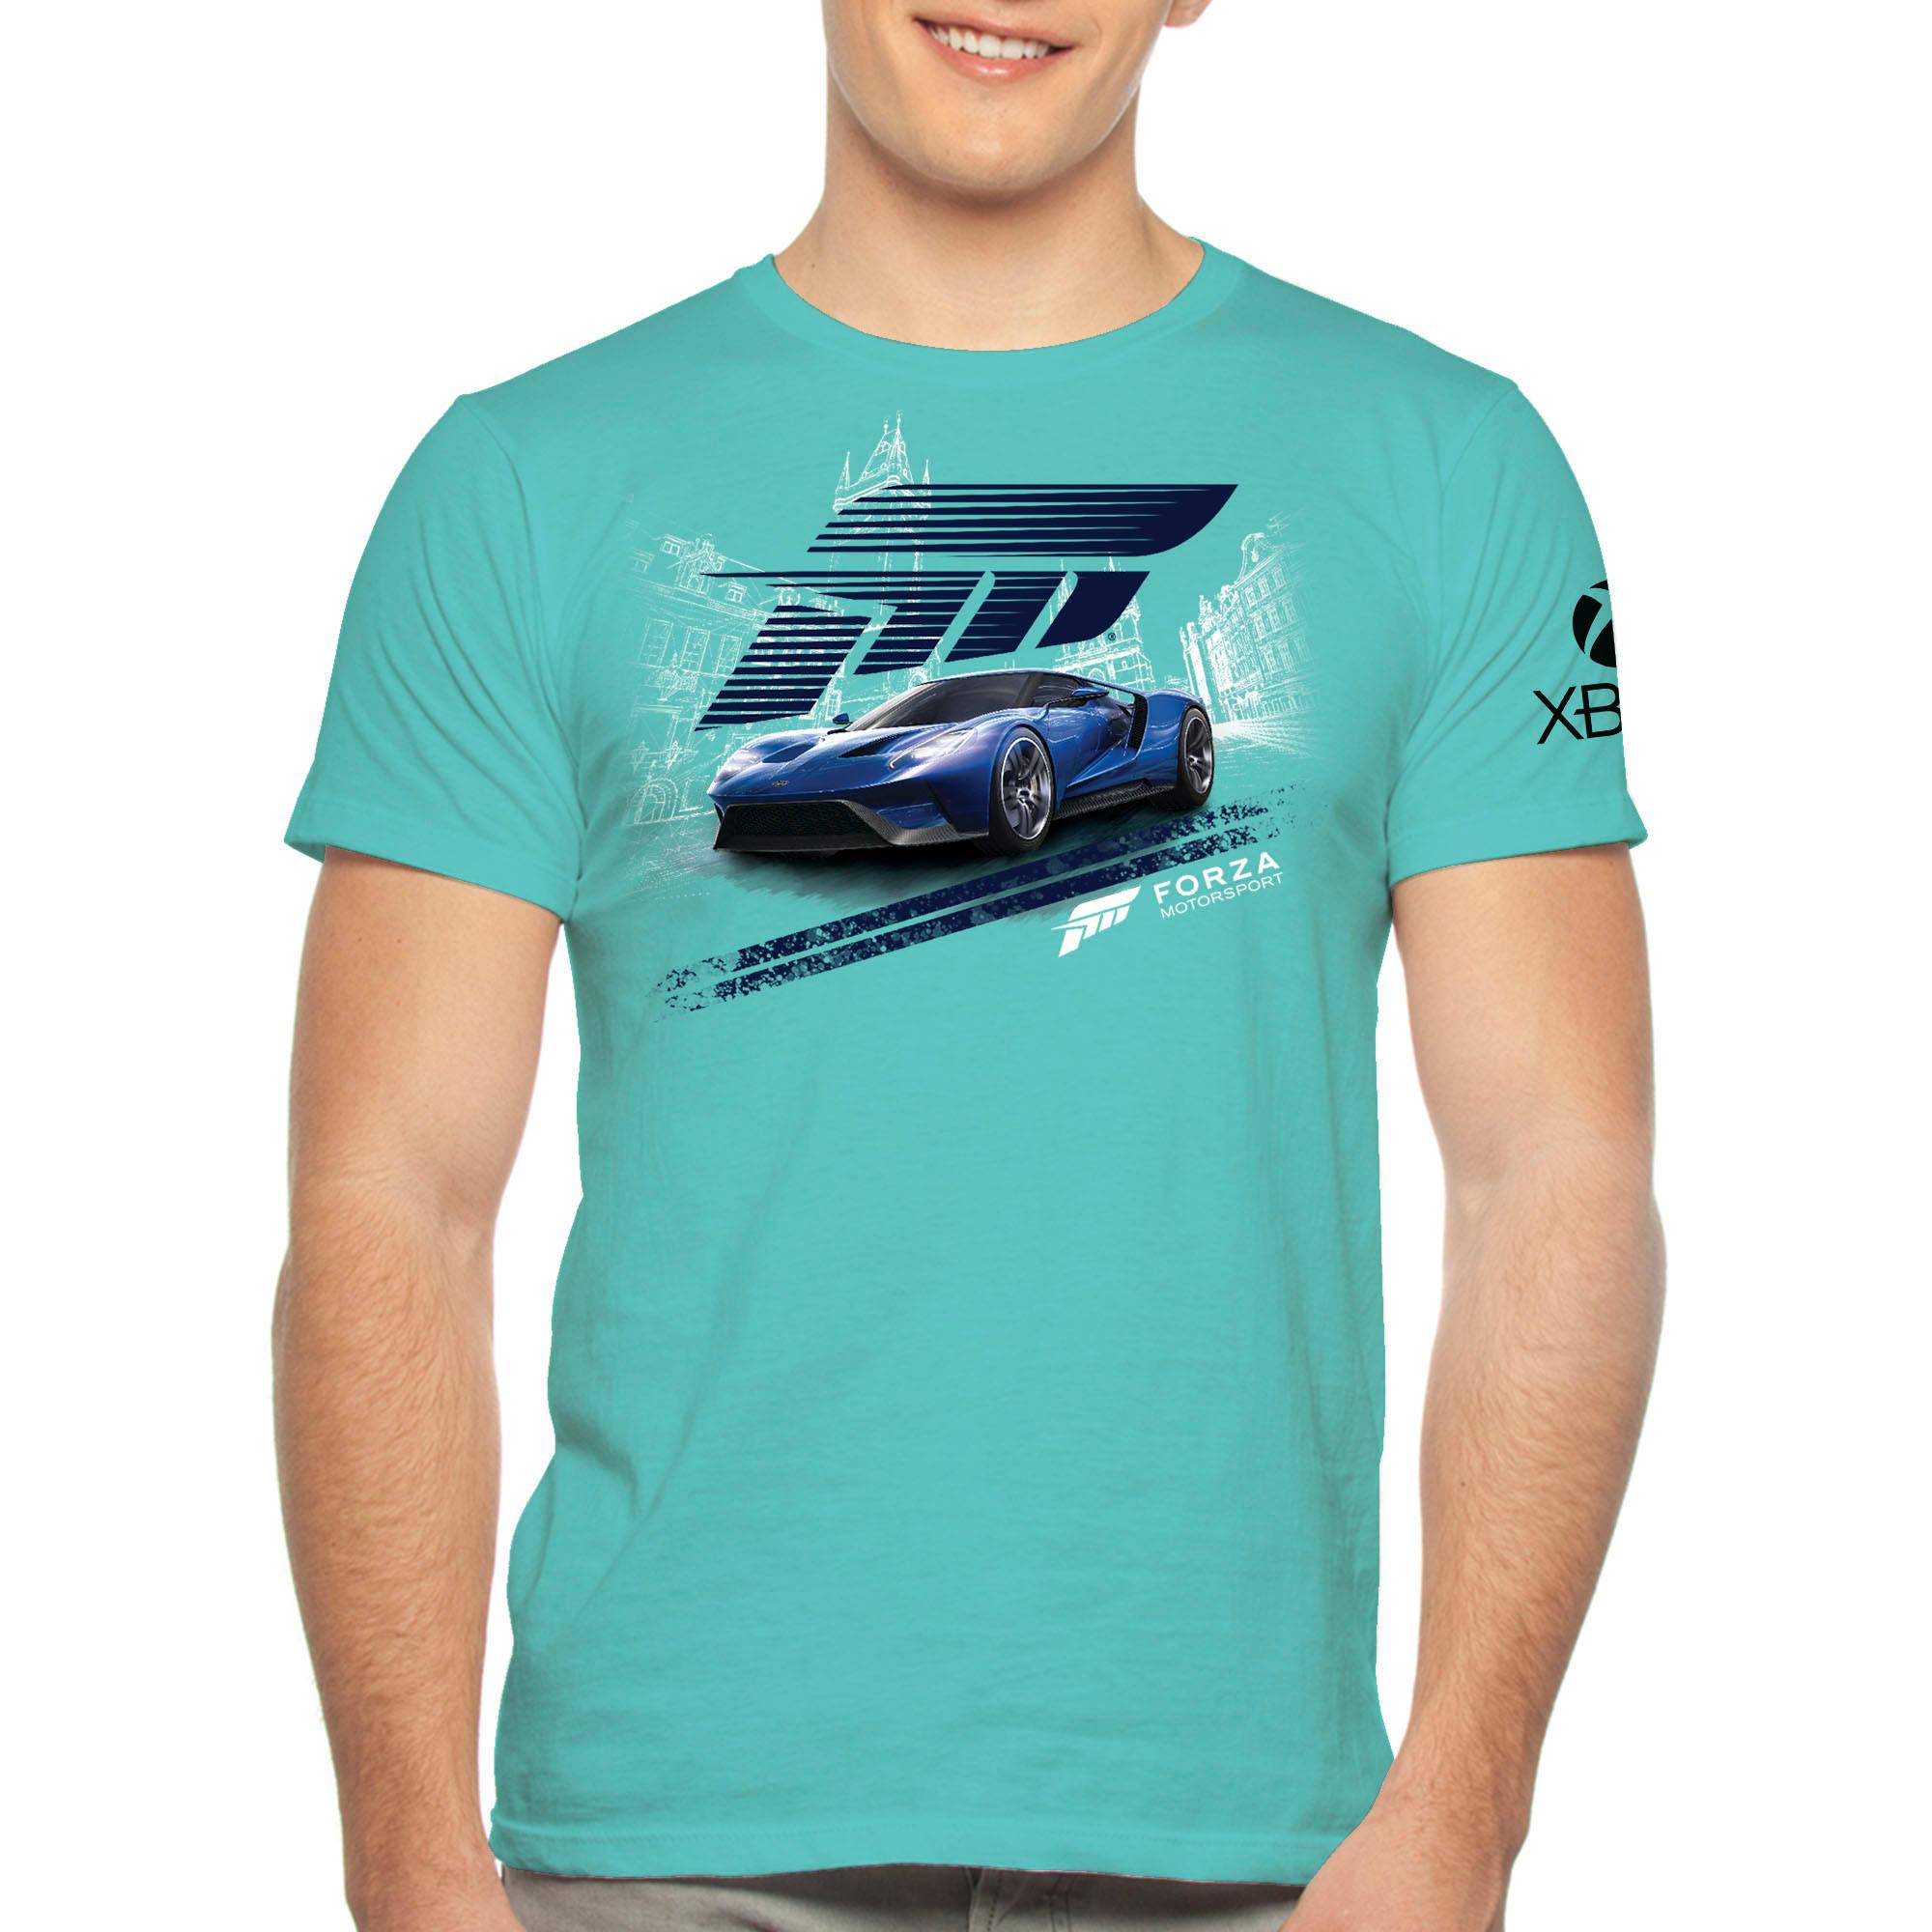 Sweatshirt Scion XB Racing Import Lowered